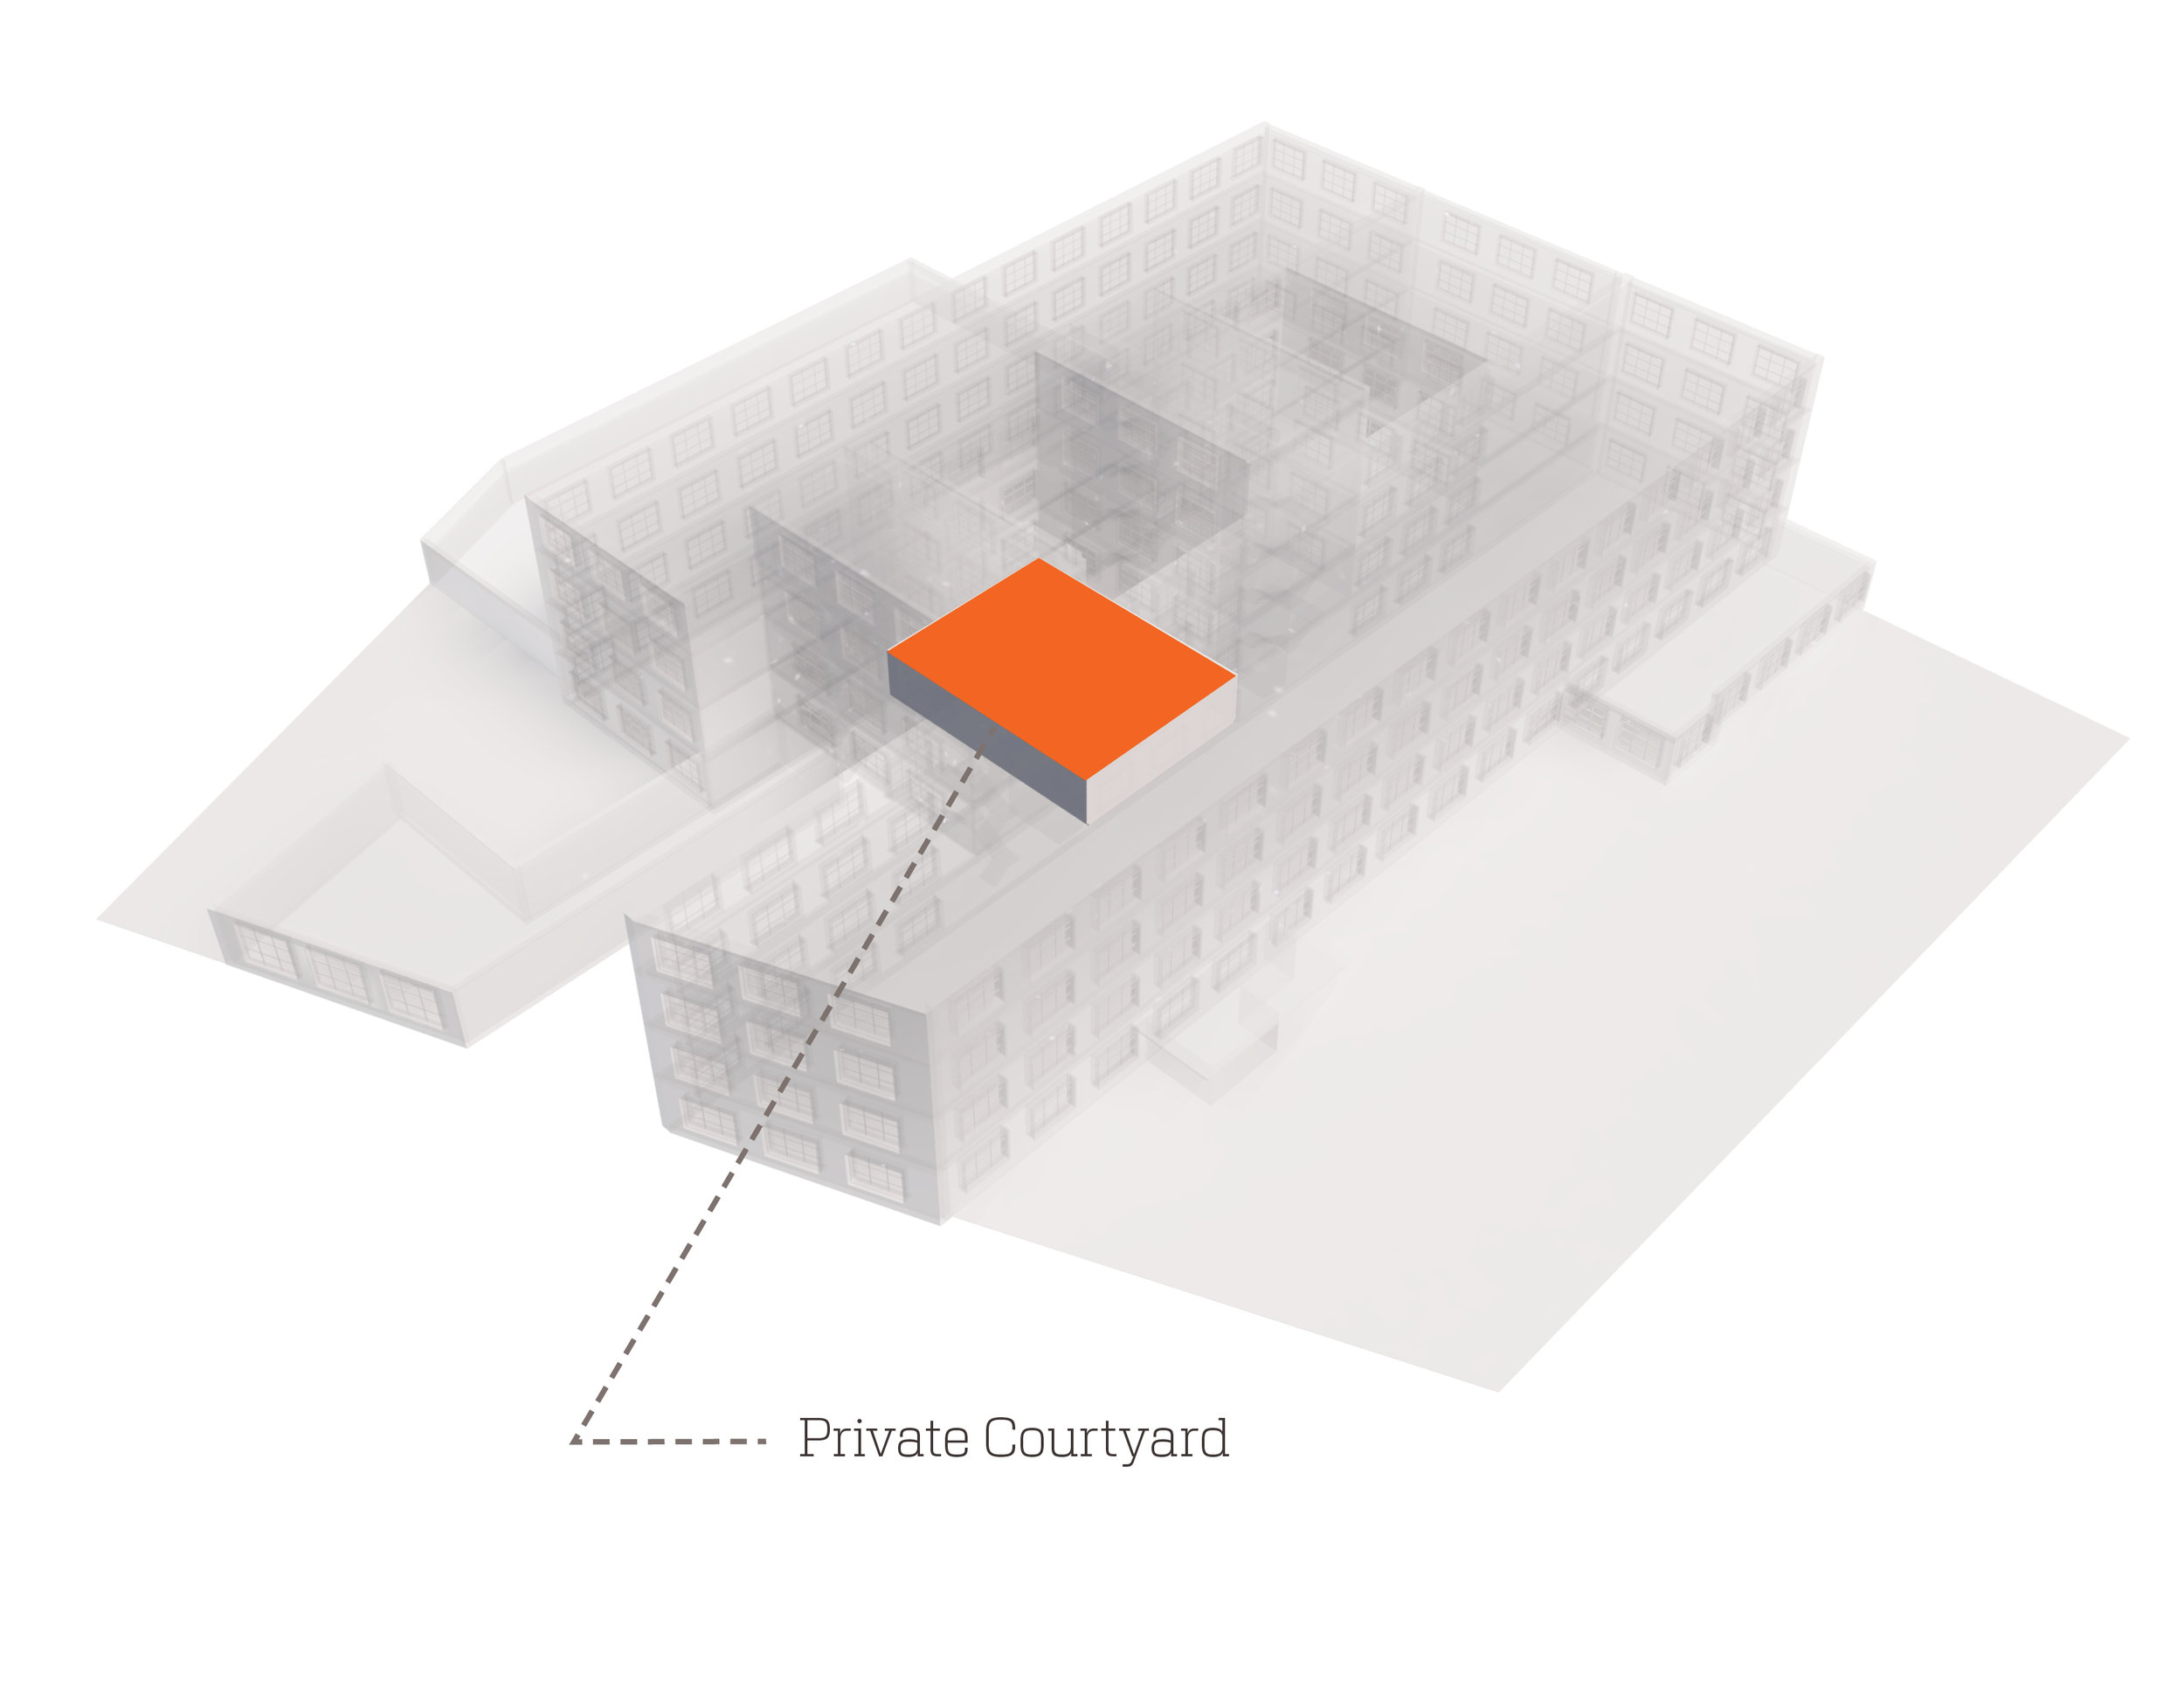 amenities diagrams11.jpg